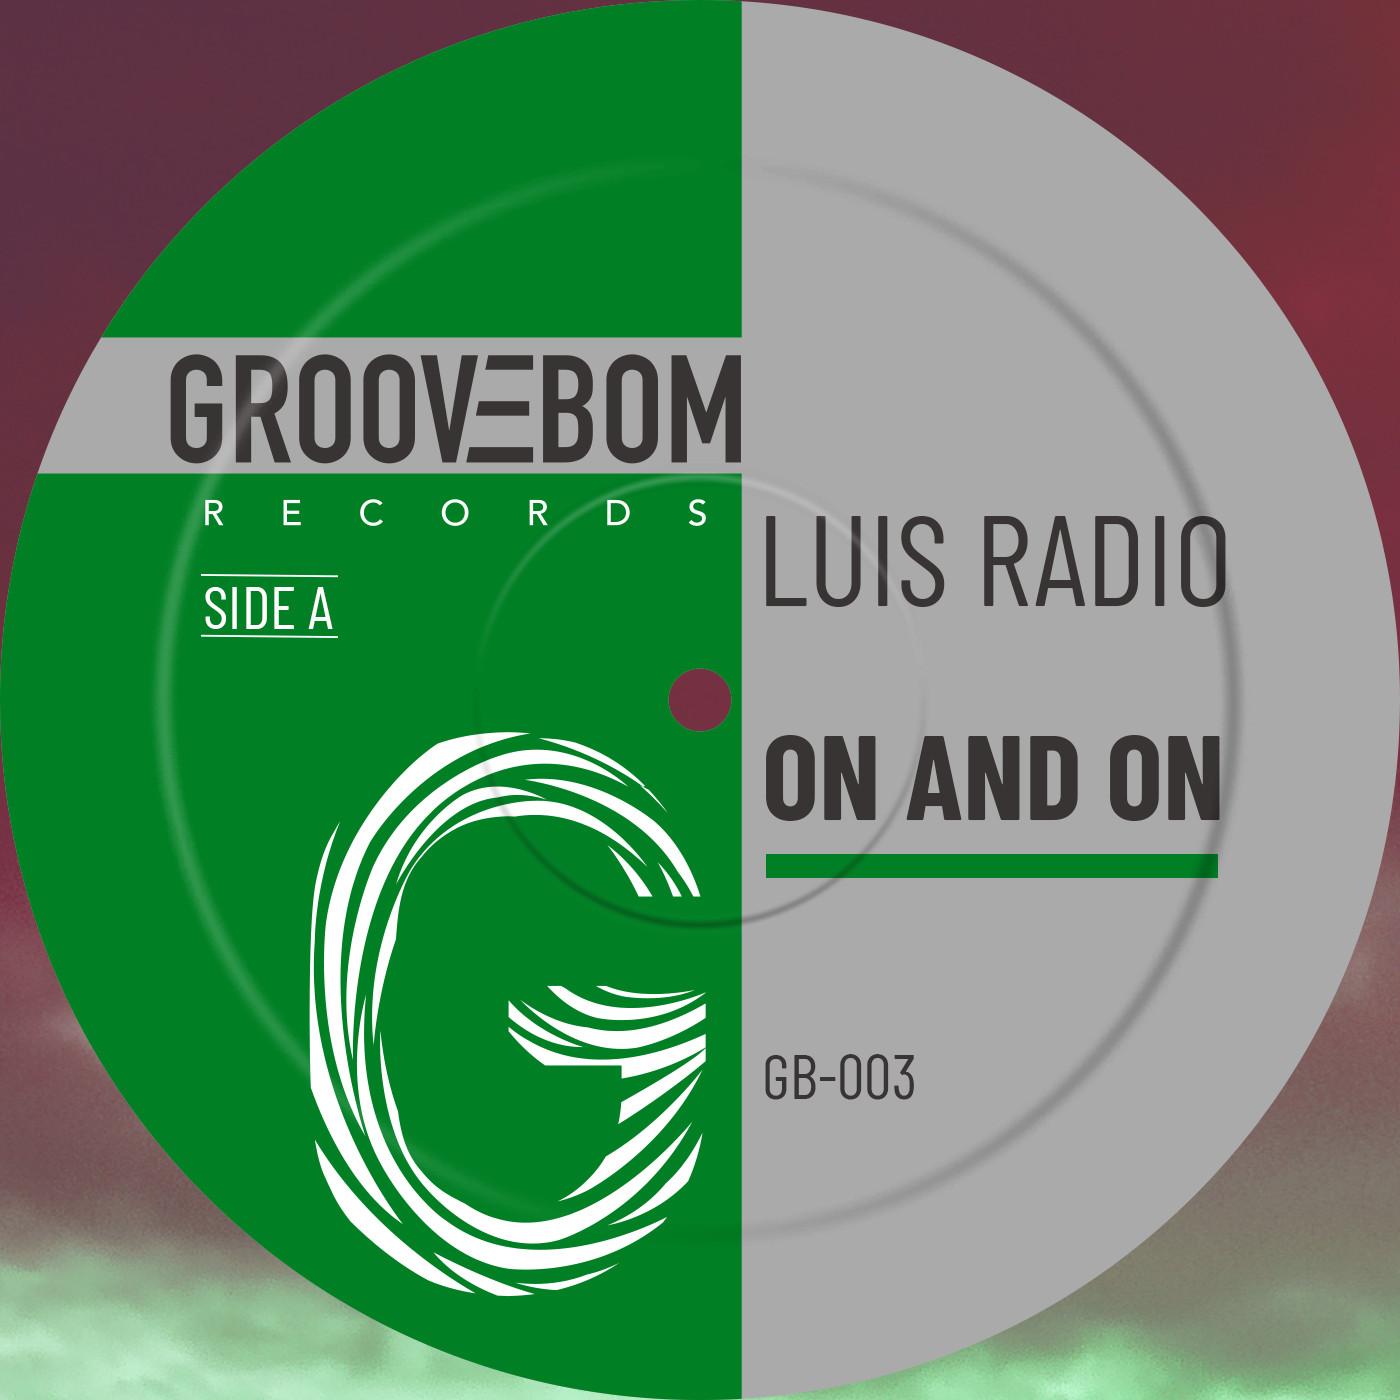 Luis Radio - On And On [Groovebom Records]